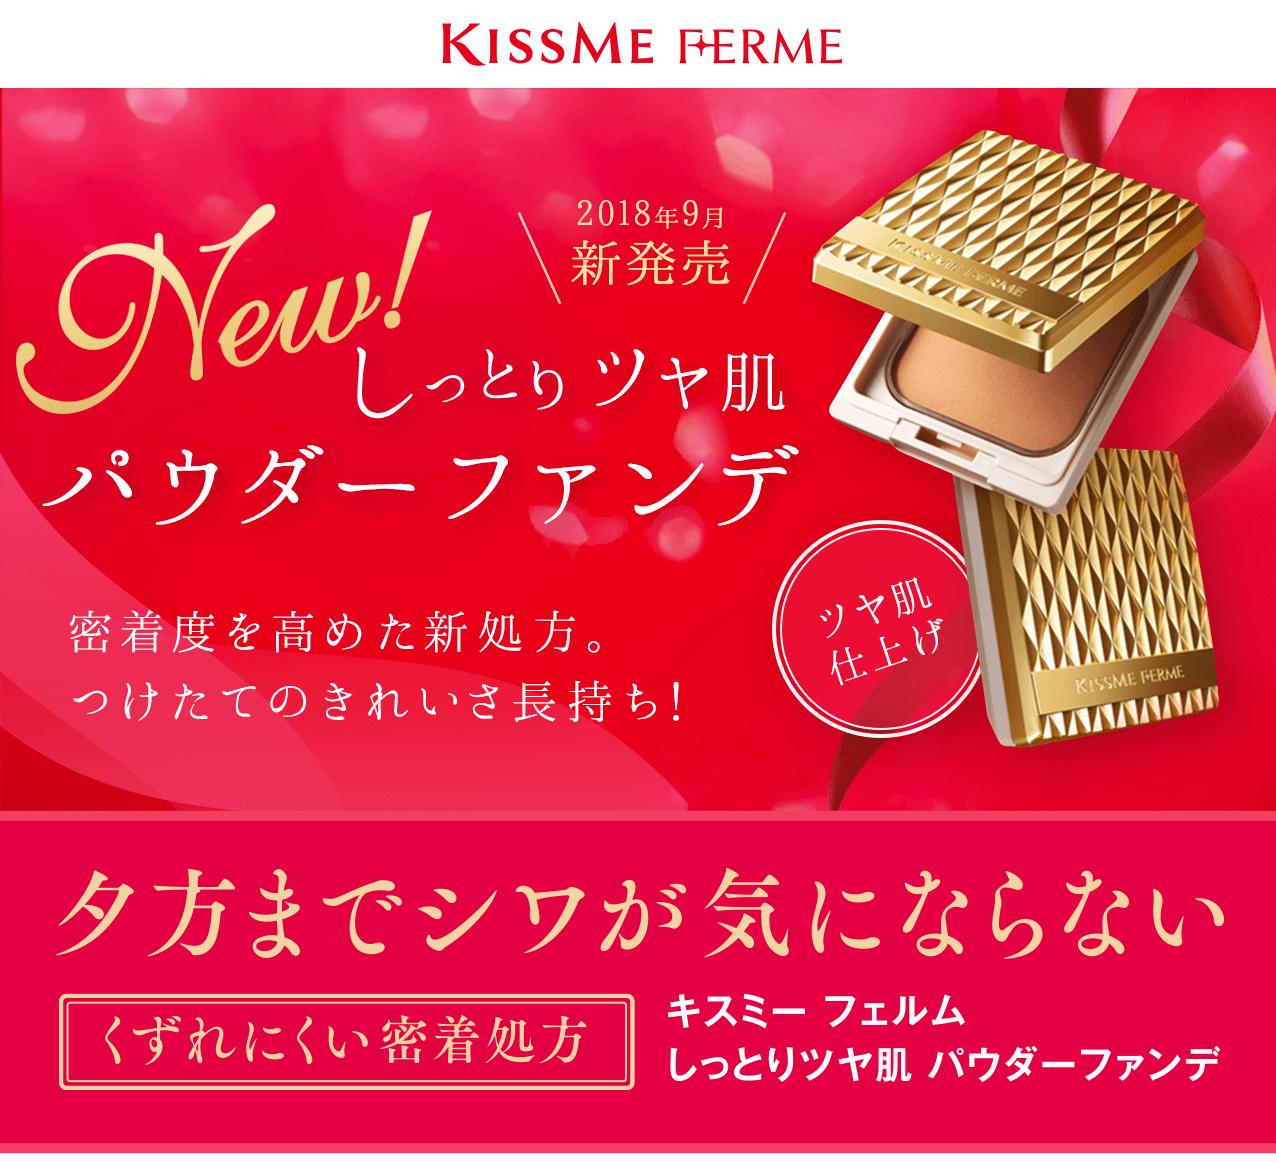 KISSME FERME New! 2018年9月新発売 しっとりツヤ肌パウダーファンデ 密着度を高めた新処方。つけたての綺麗さ長持ち! ツヤ肌仕上げ 夕方までシワが気にならない 崩れにくい密着処方 KISSME FERME しっとりツヤ肌パウダーファンデ